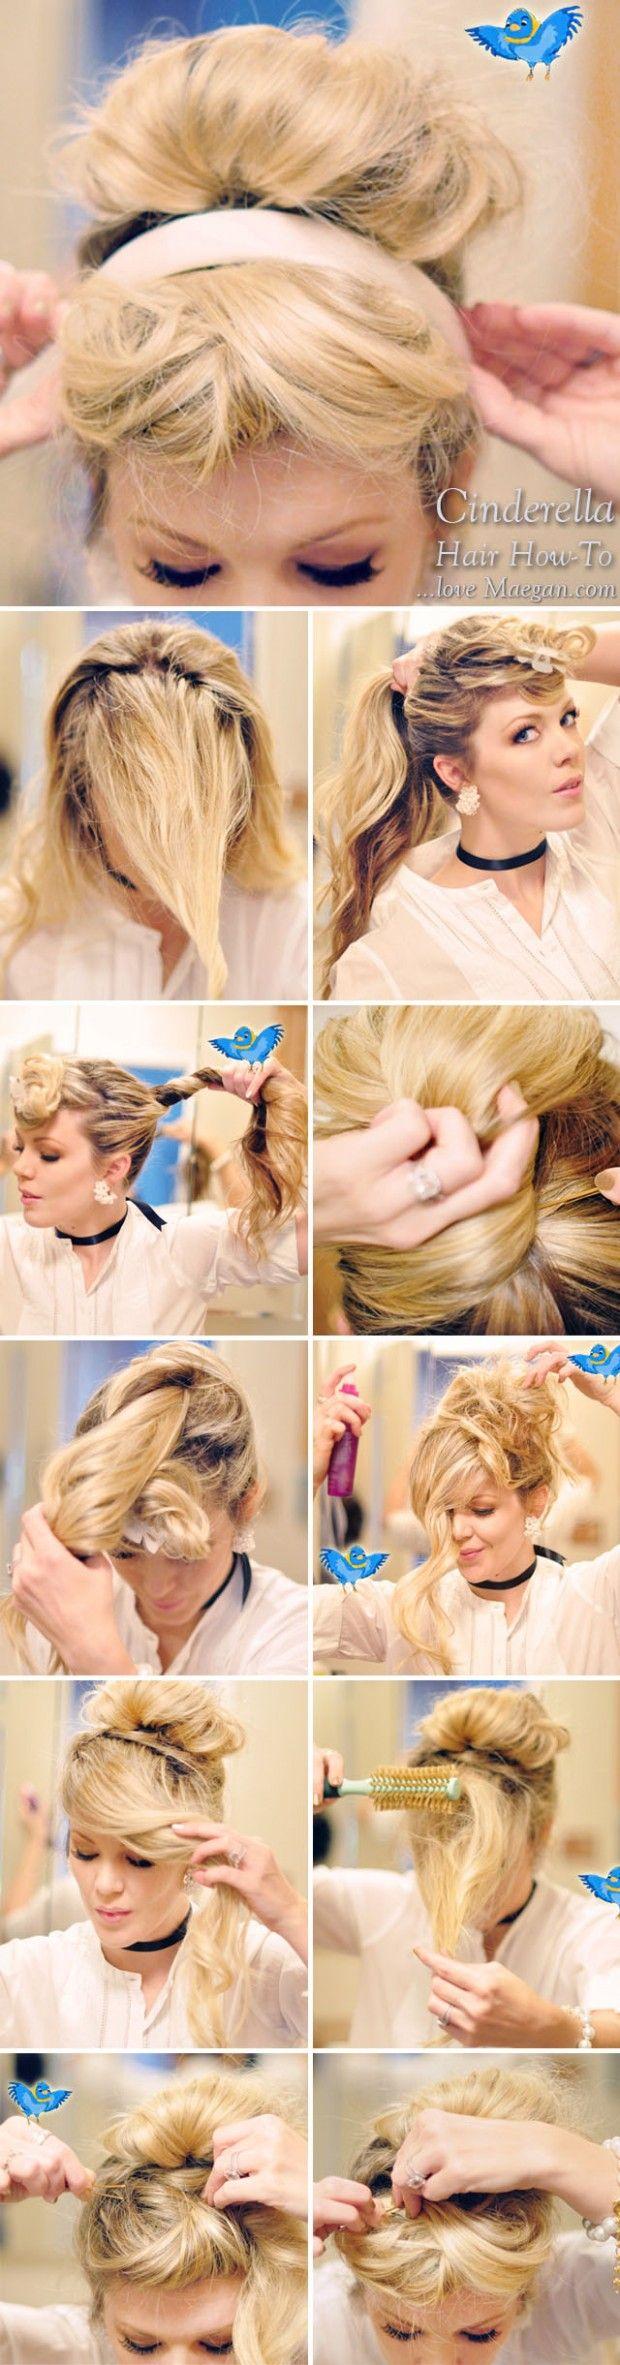 How-to Cinderella Hair & Makeup {Photo Tutorial} | ...love Maegan